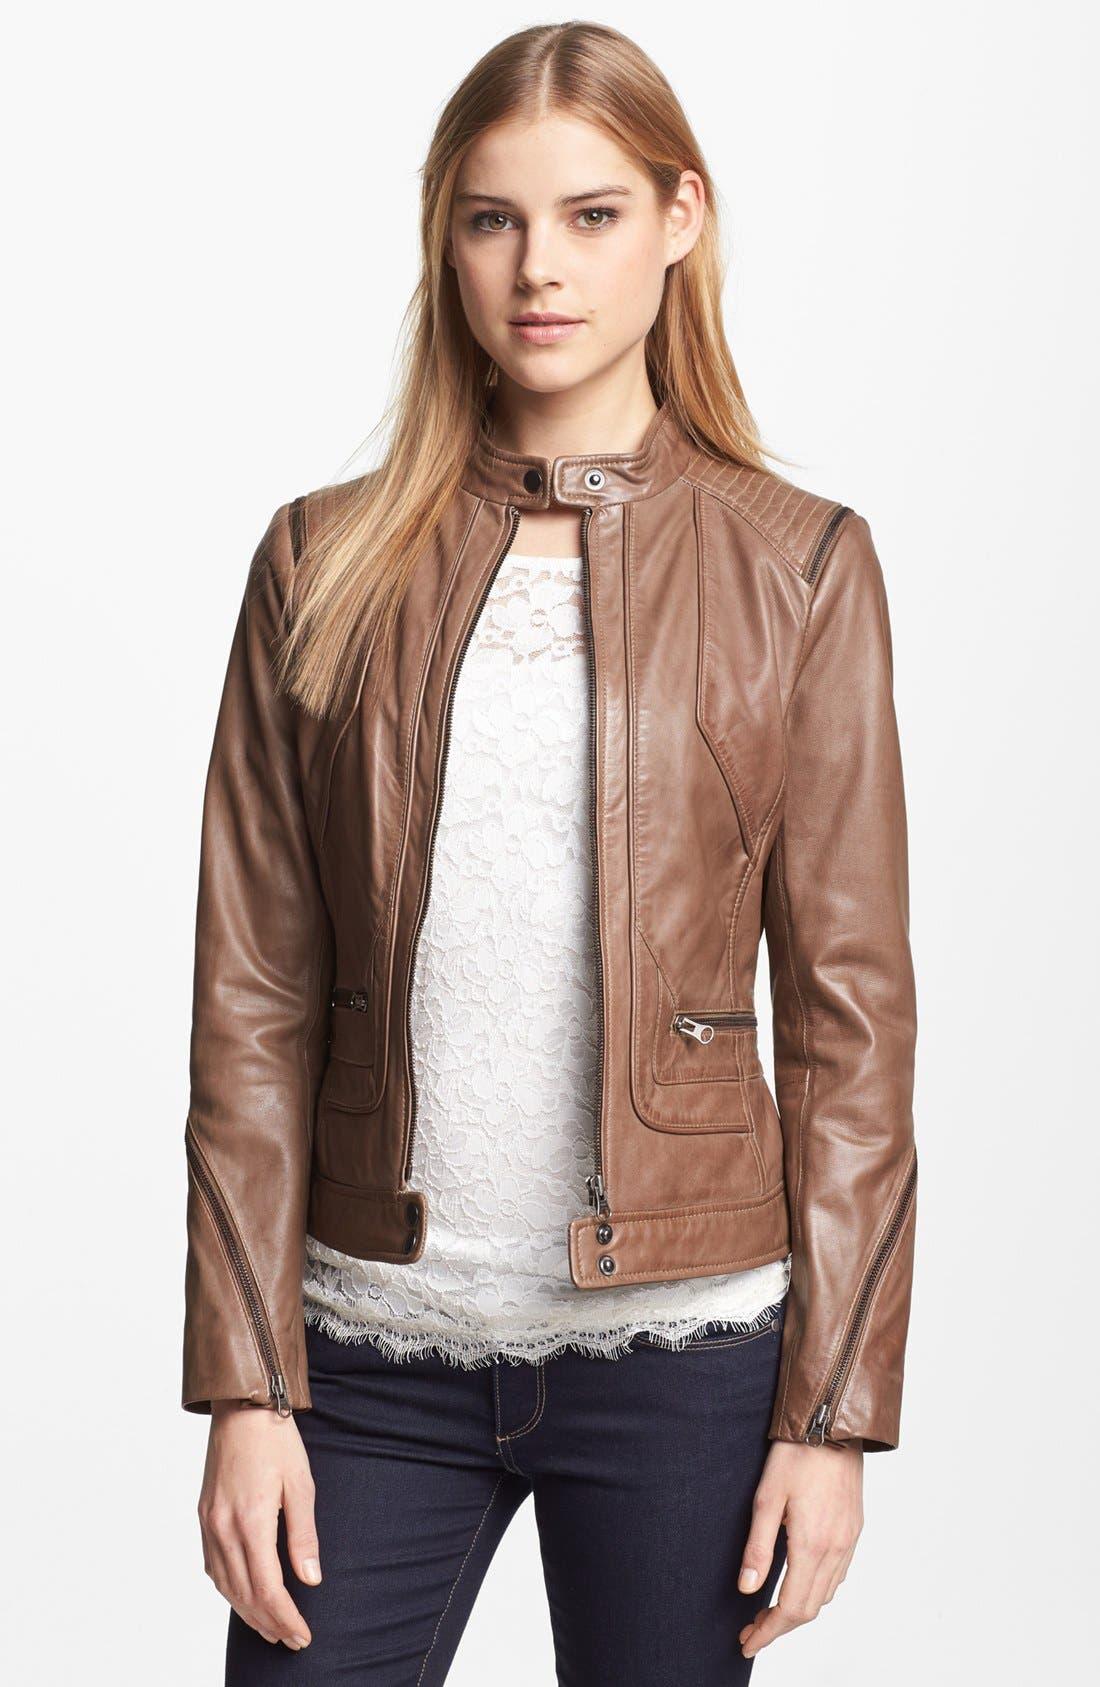 BERNARDO, Zip Trim Leather Scuba Jacket, Main thumbnail 1, color, 270